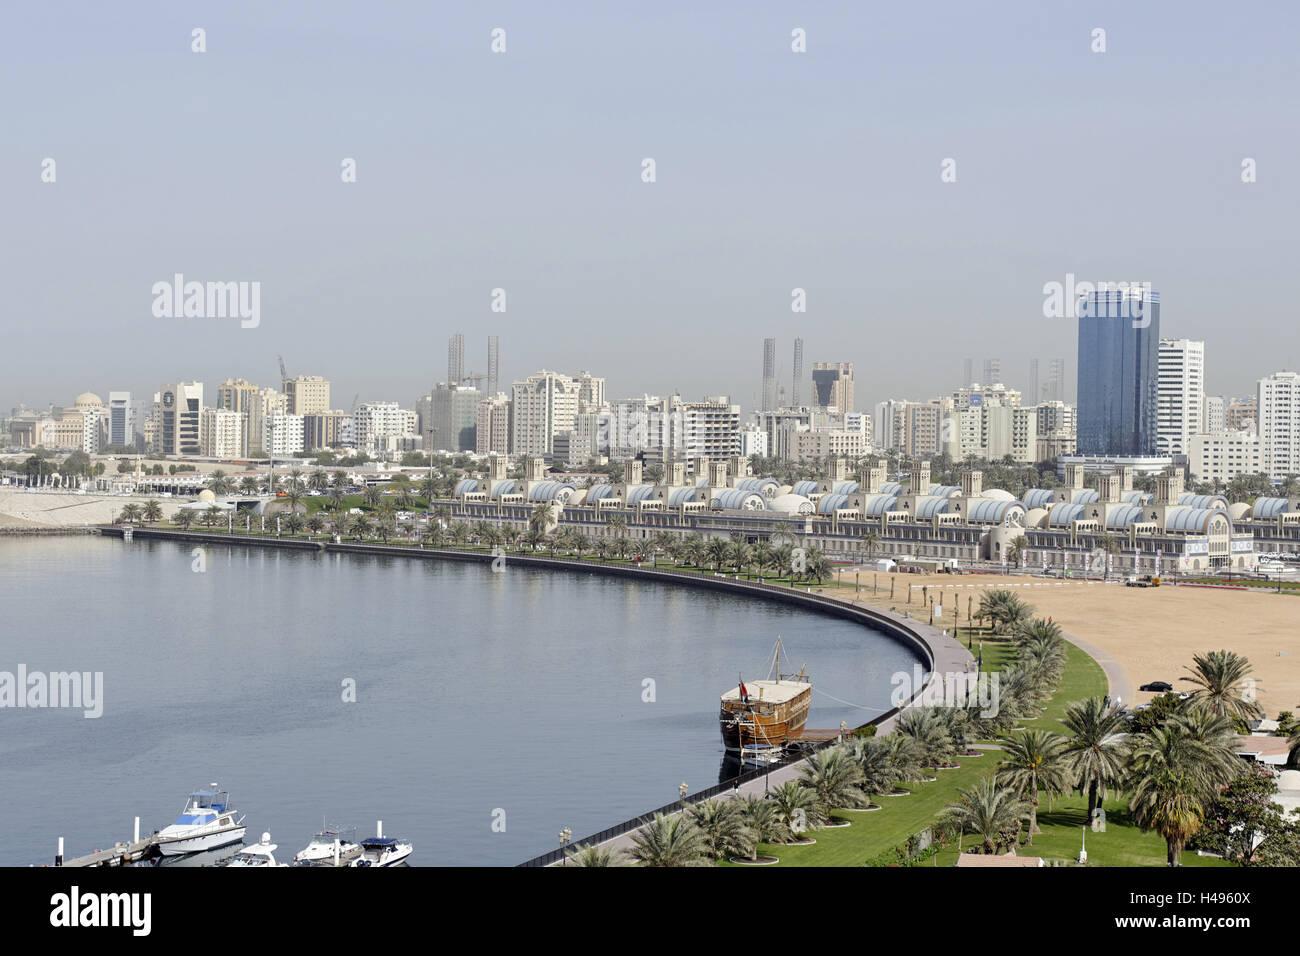 Old Souk, blue Souk, traditional shopping centre, Emirate of Sharjah, United Arab Emirates, Arabian Peninsula, the - Stock Image